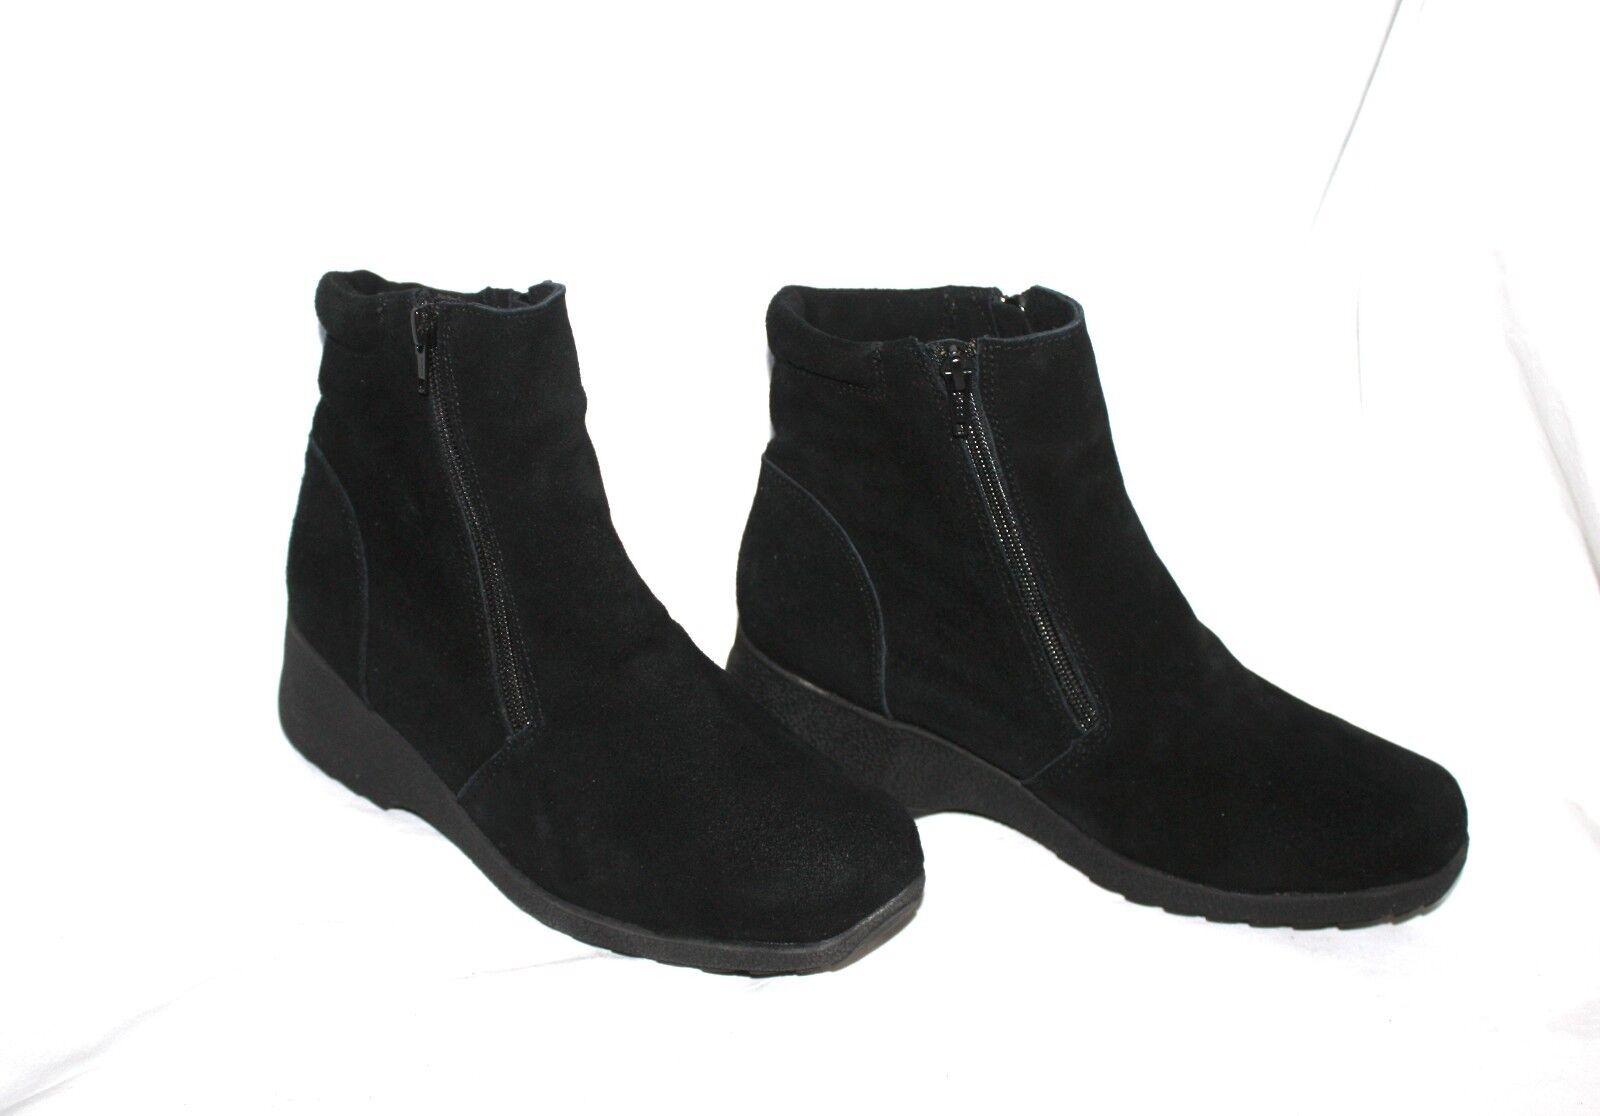 Aquatherm By Santana Sasha 3 Black Suede Double Zipper Ankle Wedge Boots Sz 9 M